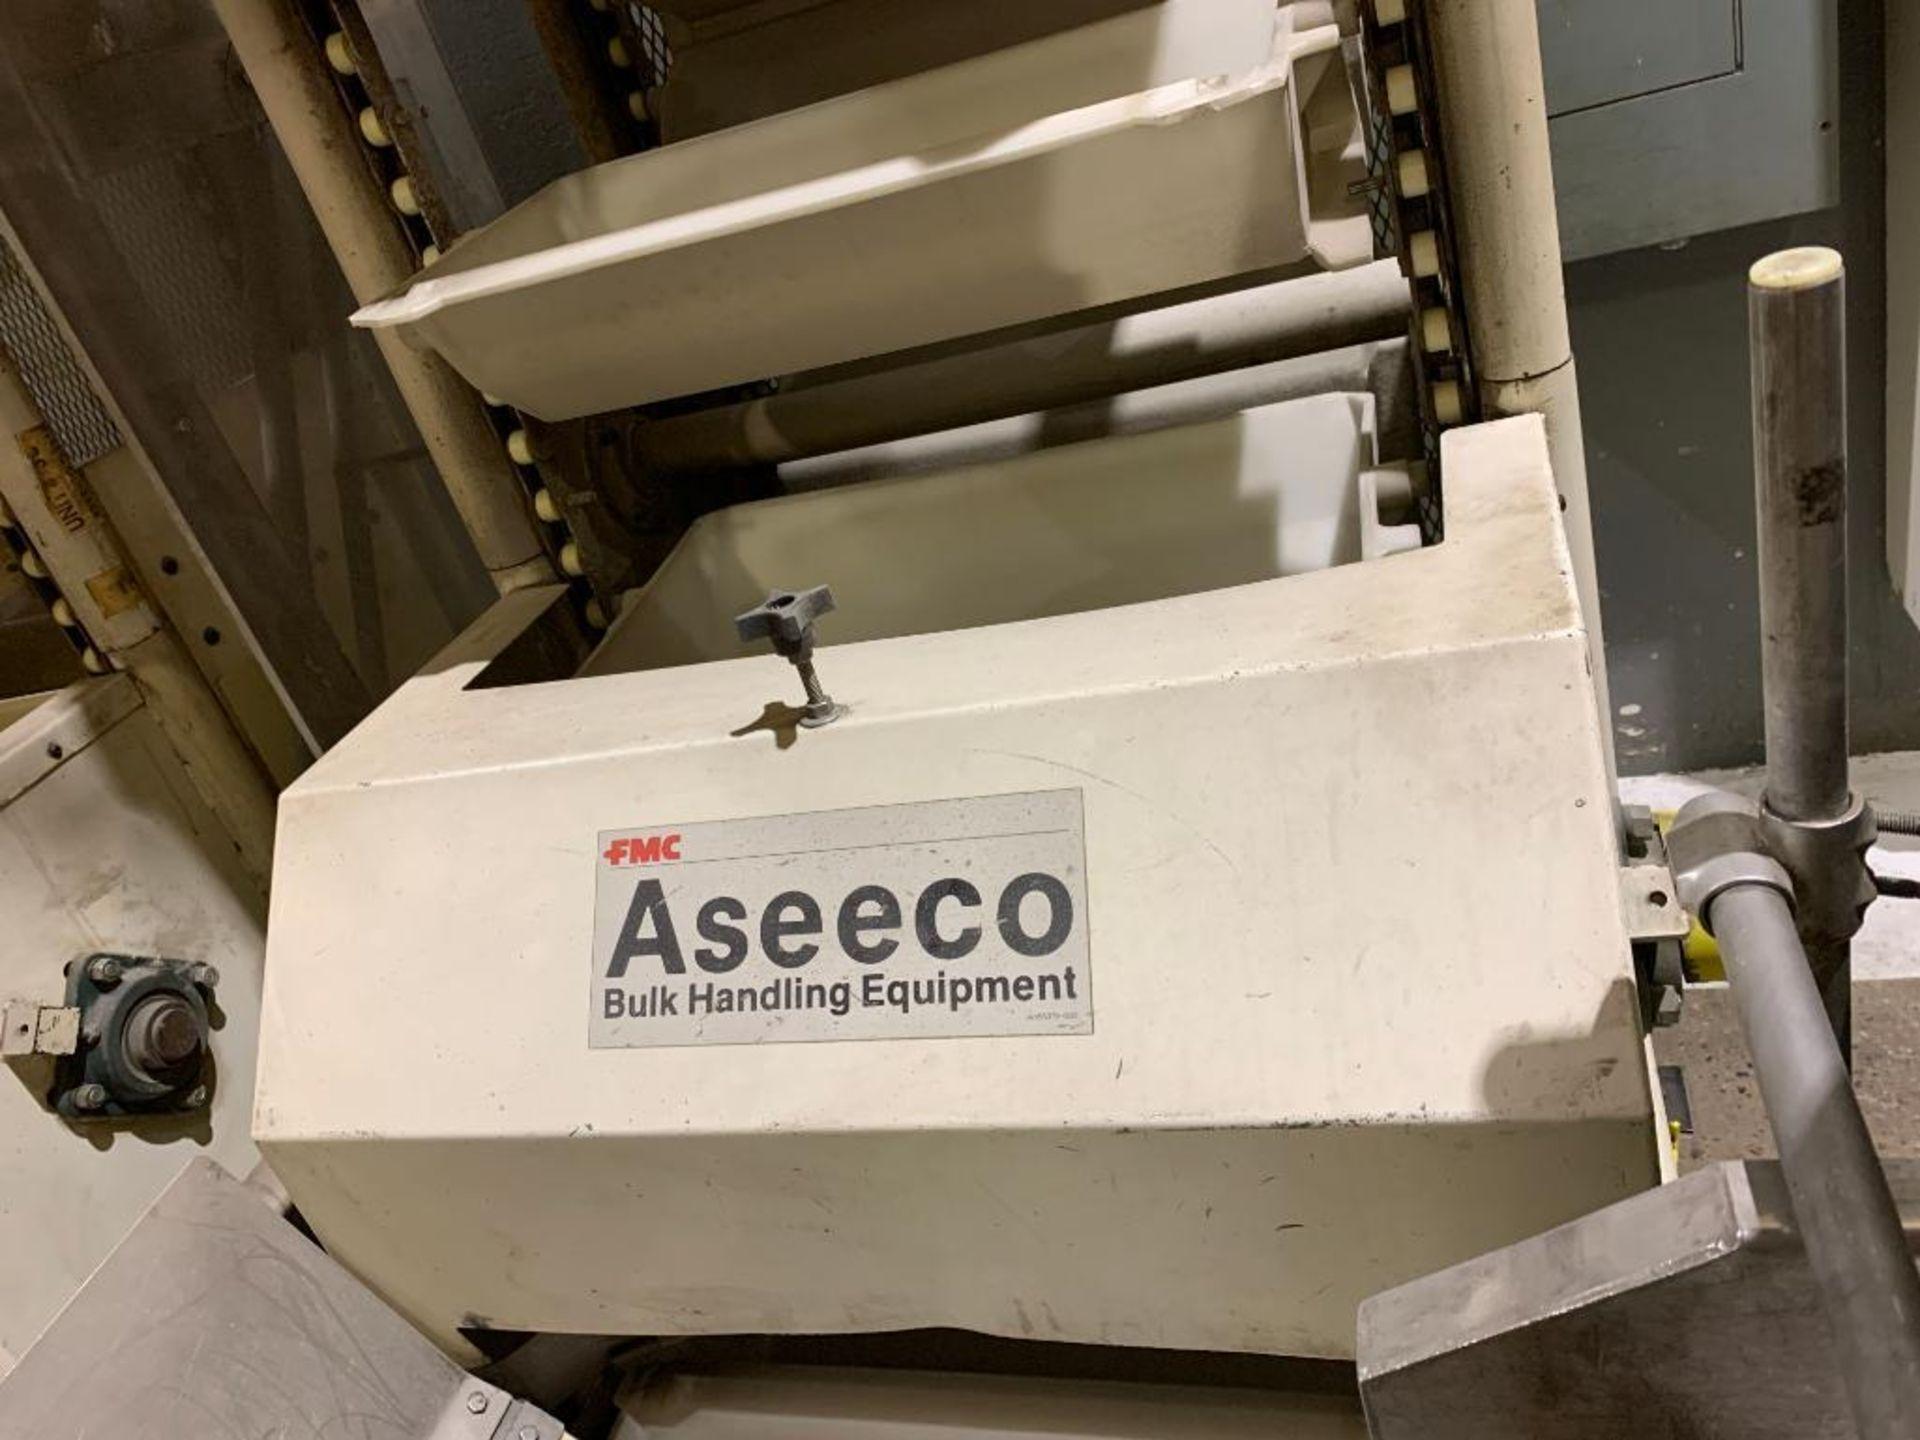 1992 Aseeco horizontal bucket elevator, model ALH-0-24-CP - Image 8 of 18